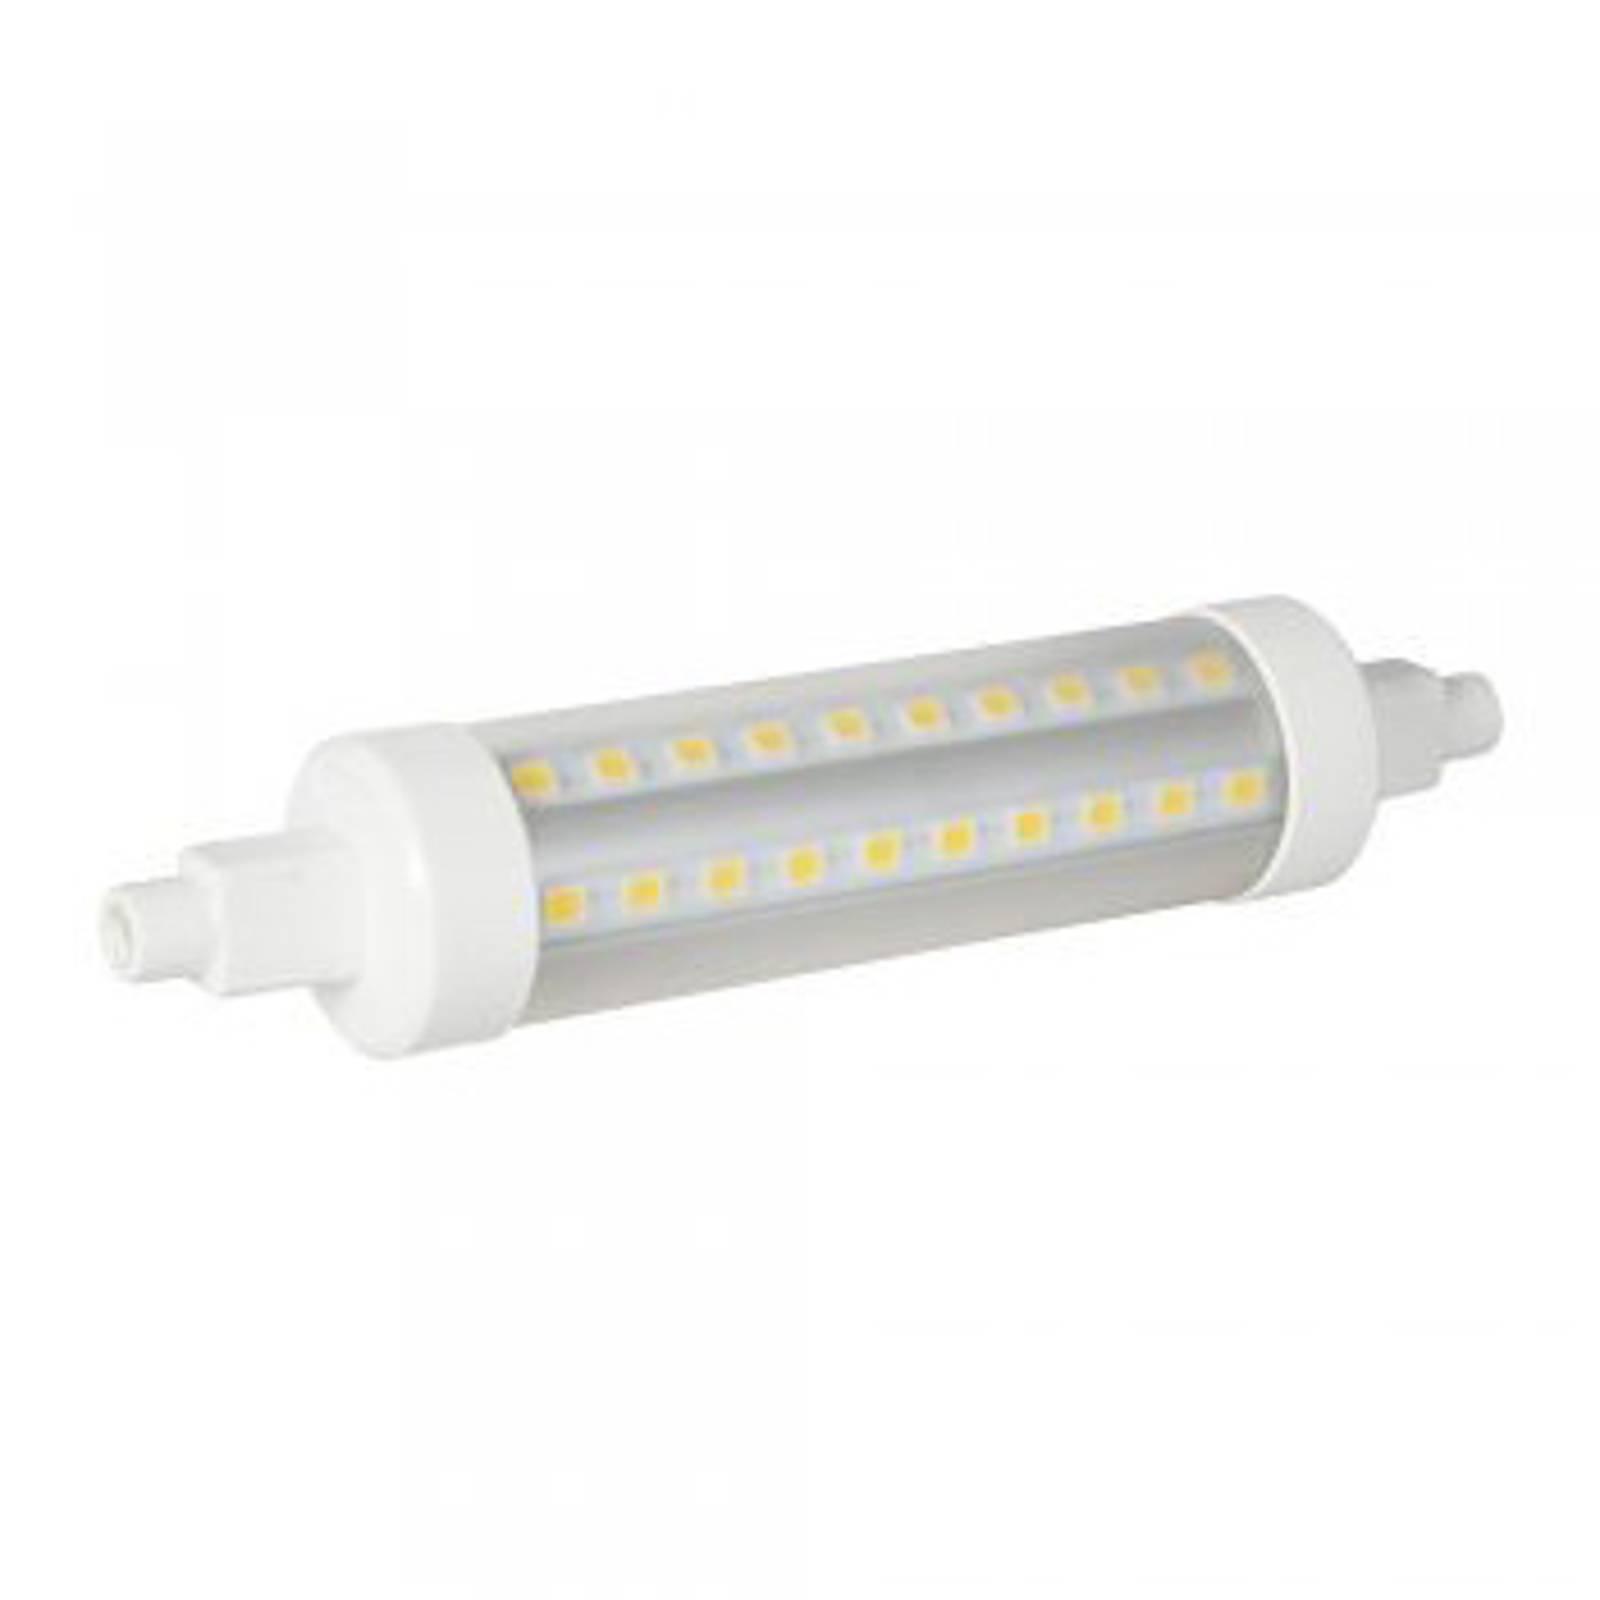 Lampadina LED R7s 8 W 827 VEO a bastoncino